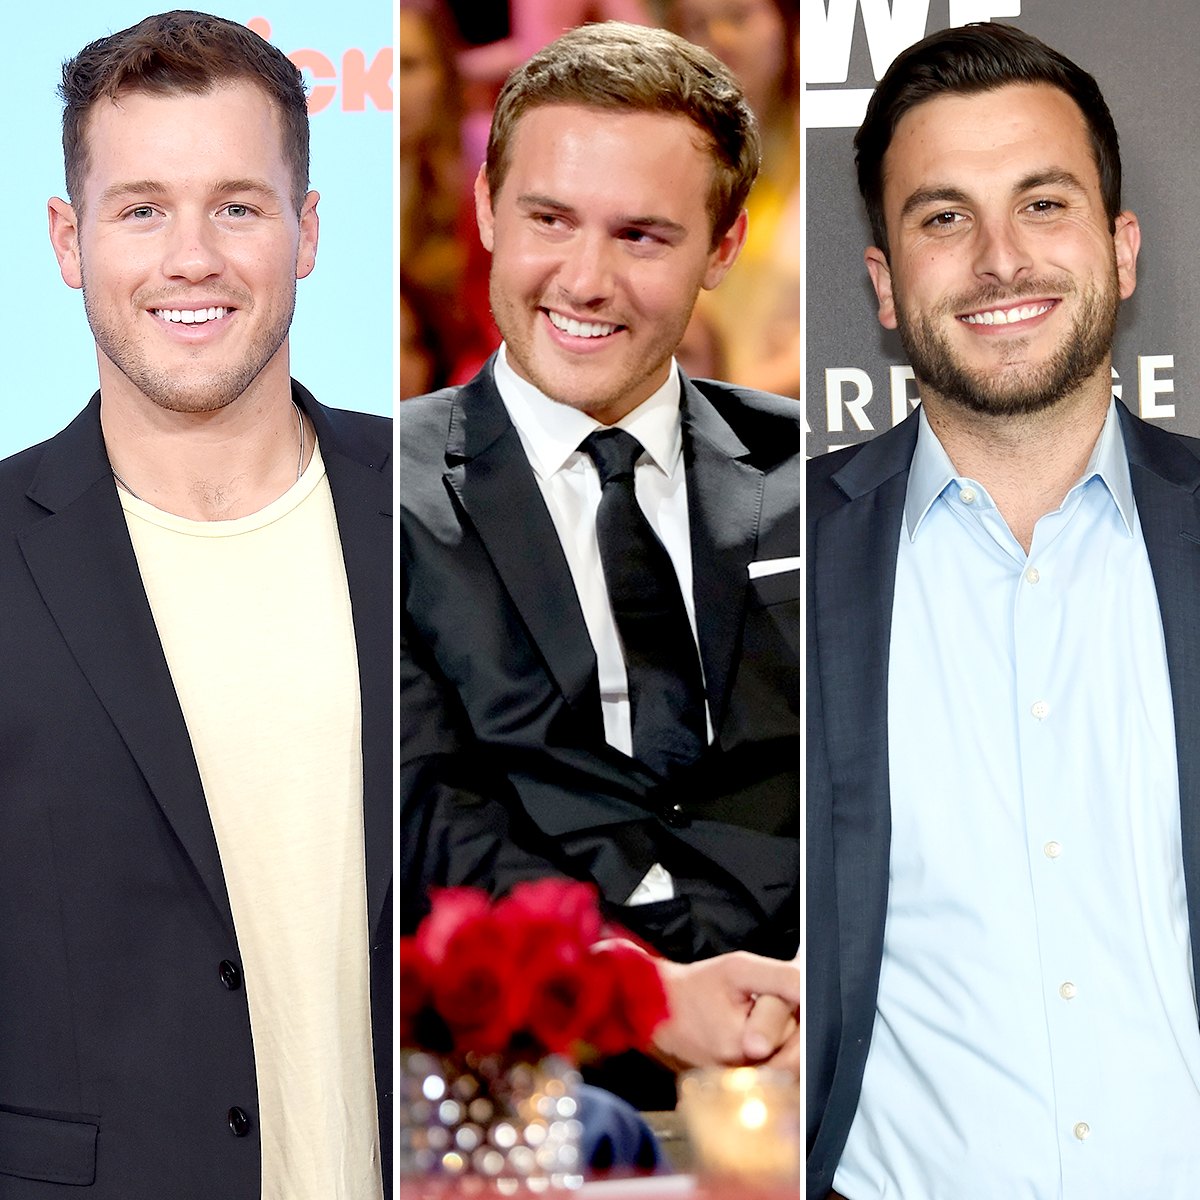 Colton-Underwood-Peter-Weber-Next-Bachelor-Tanner-Tolbert